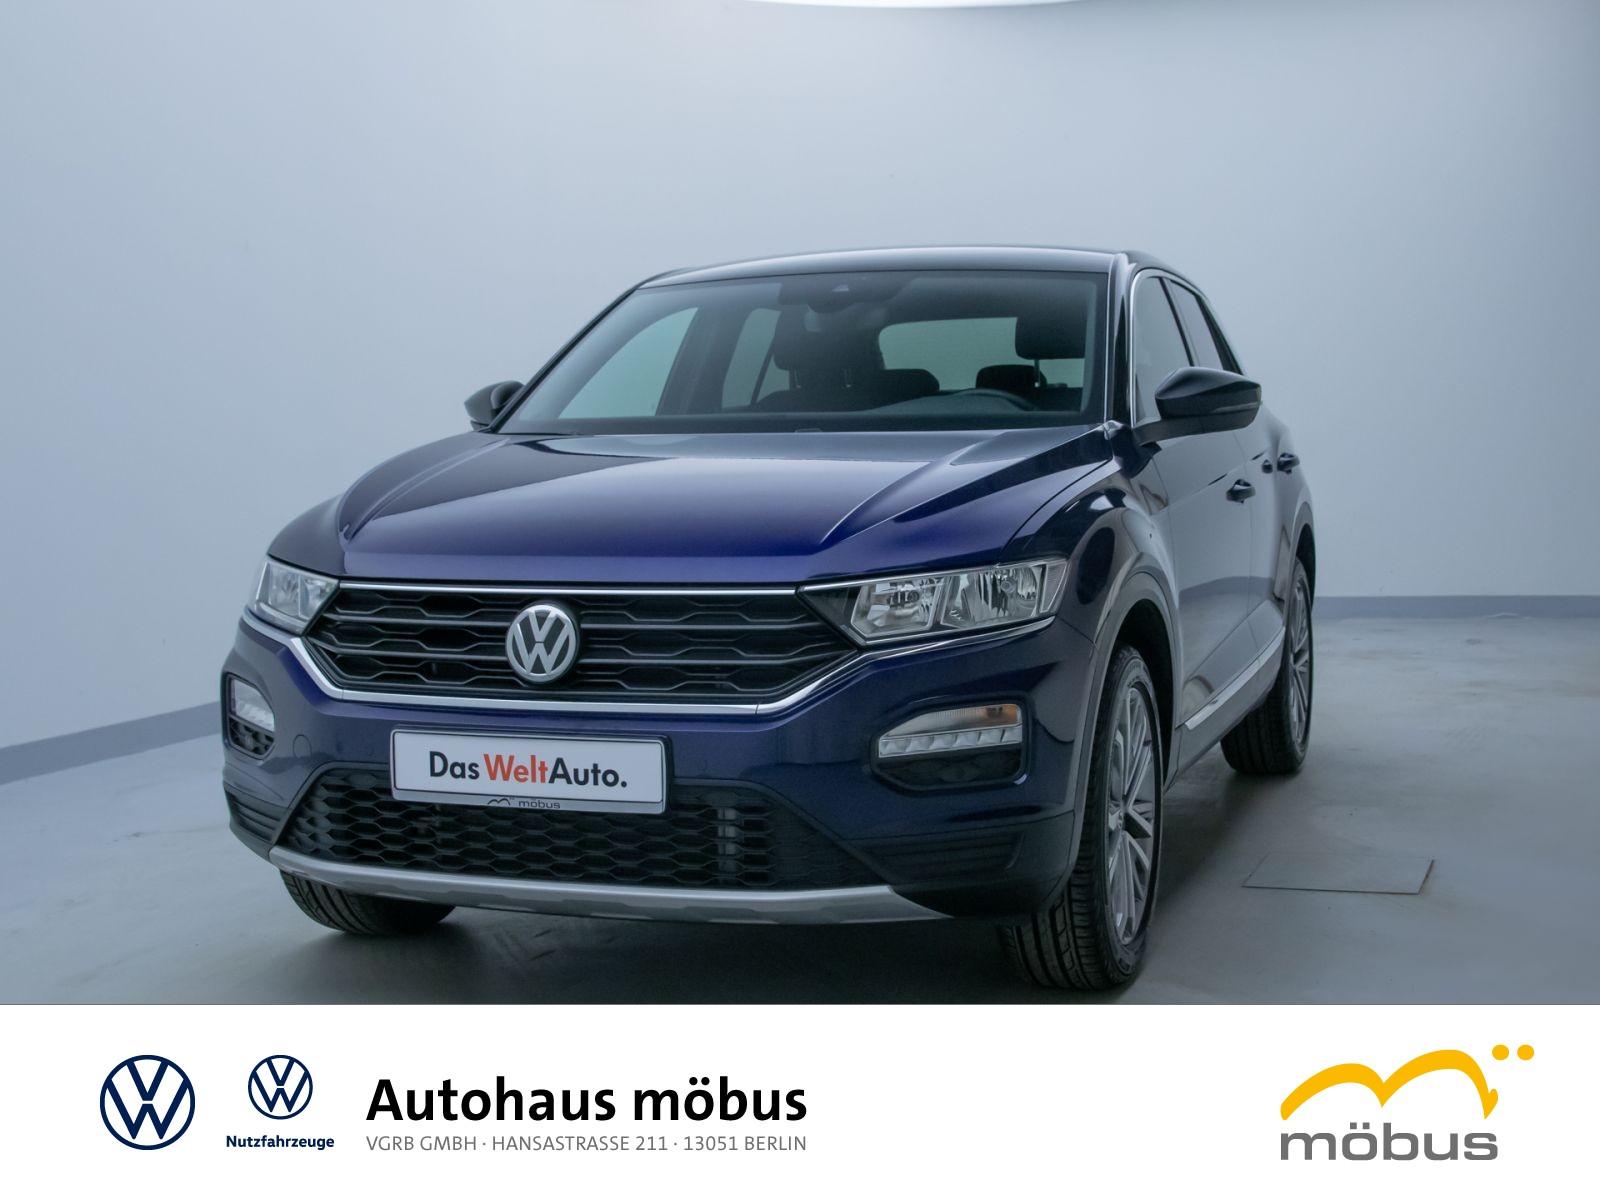 Volkswagen T-Roc 1.5 TSI*UNITED*NAVI*DAB*AID*PDC*APP*SITZHZ, Jahr 2020, Benzin